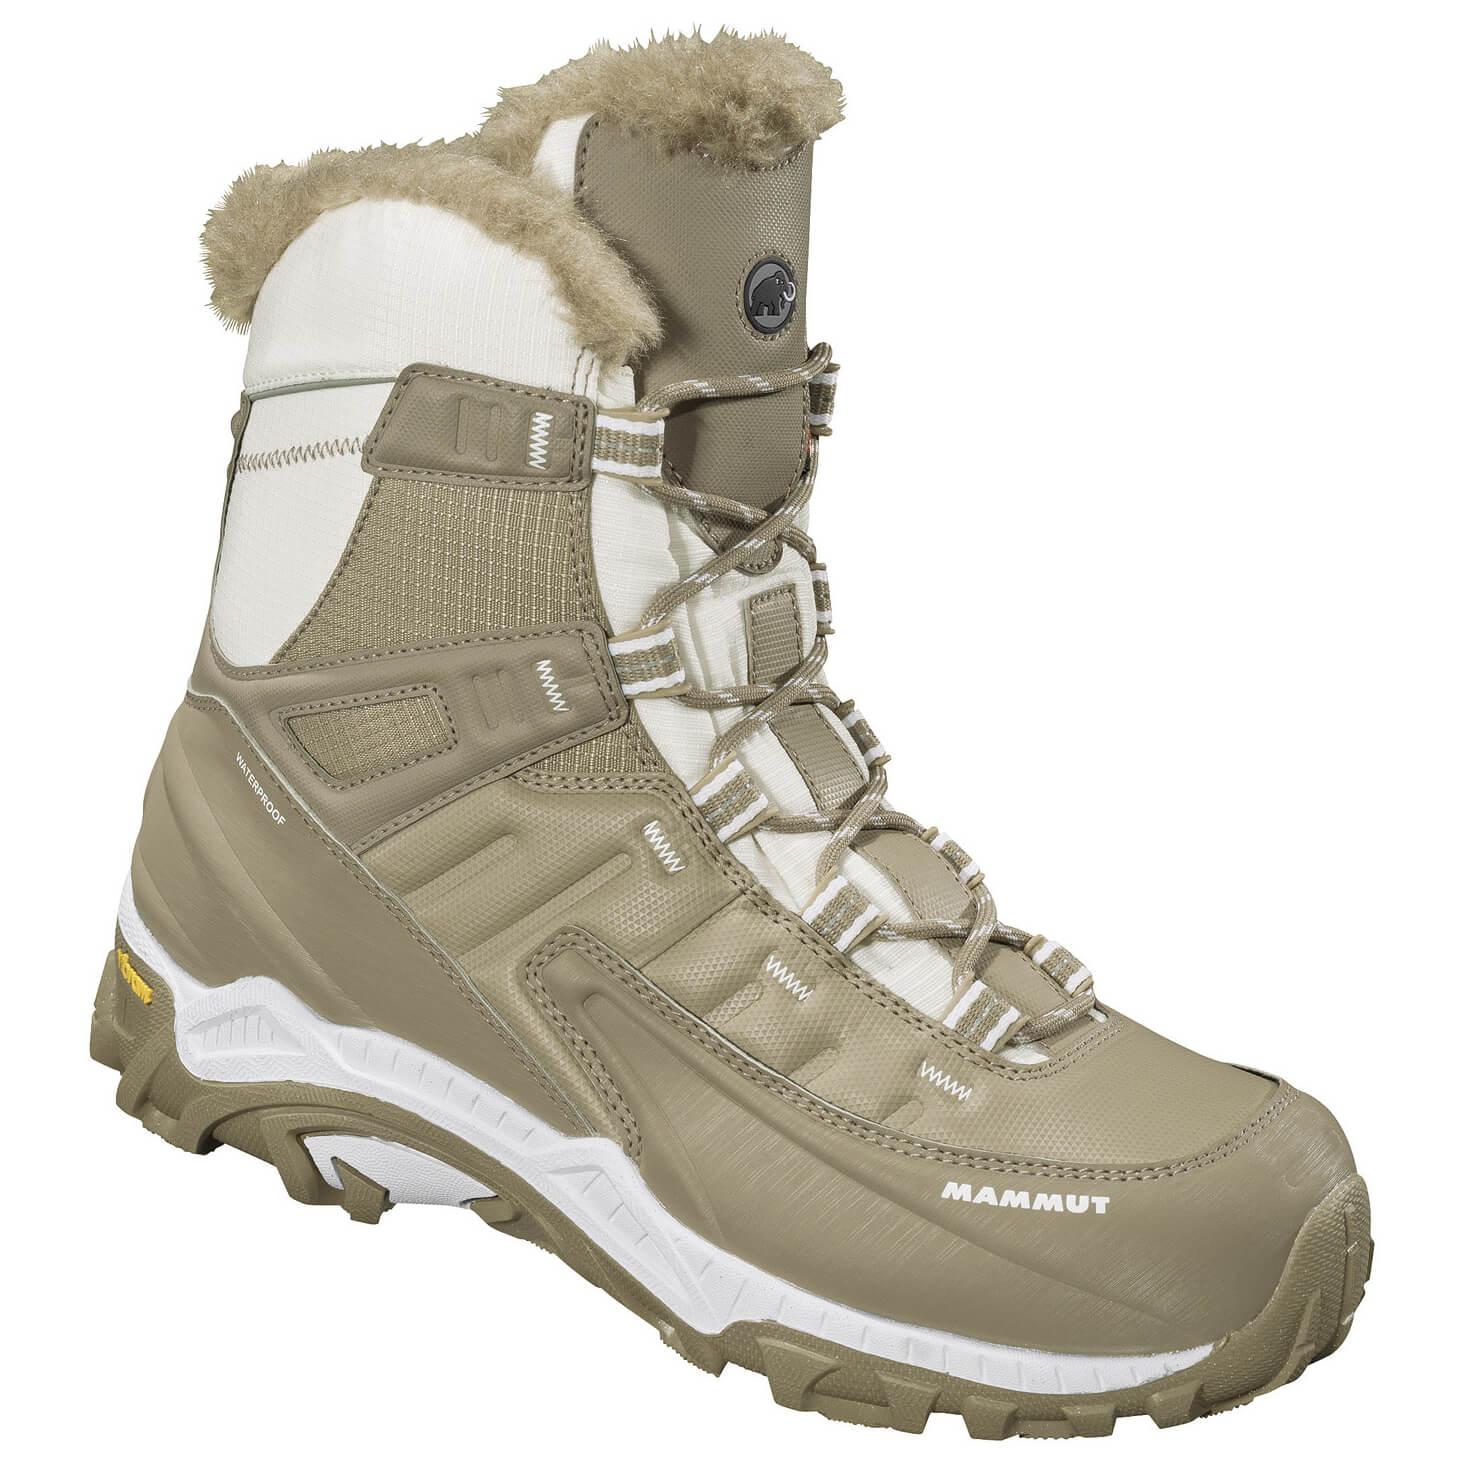 low priced online retailer sale retailer Mammut - Women's Blackfin II High WP - Winter boots